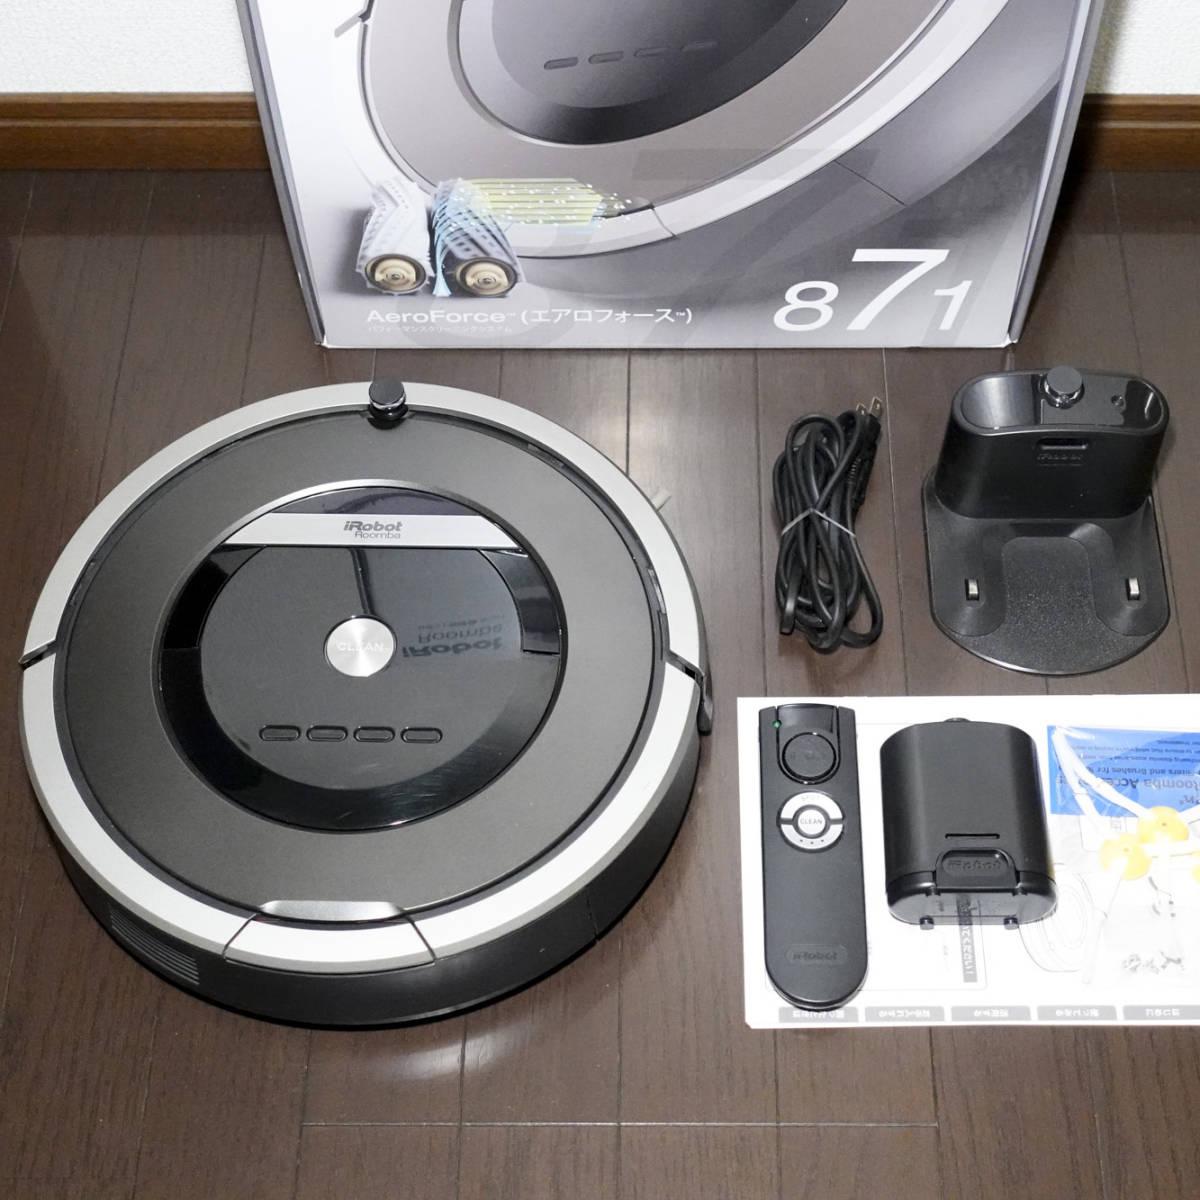 iRobot Roomba 871 自動掃除機ルンバ 元箱 付属品完備 オマケ付